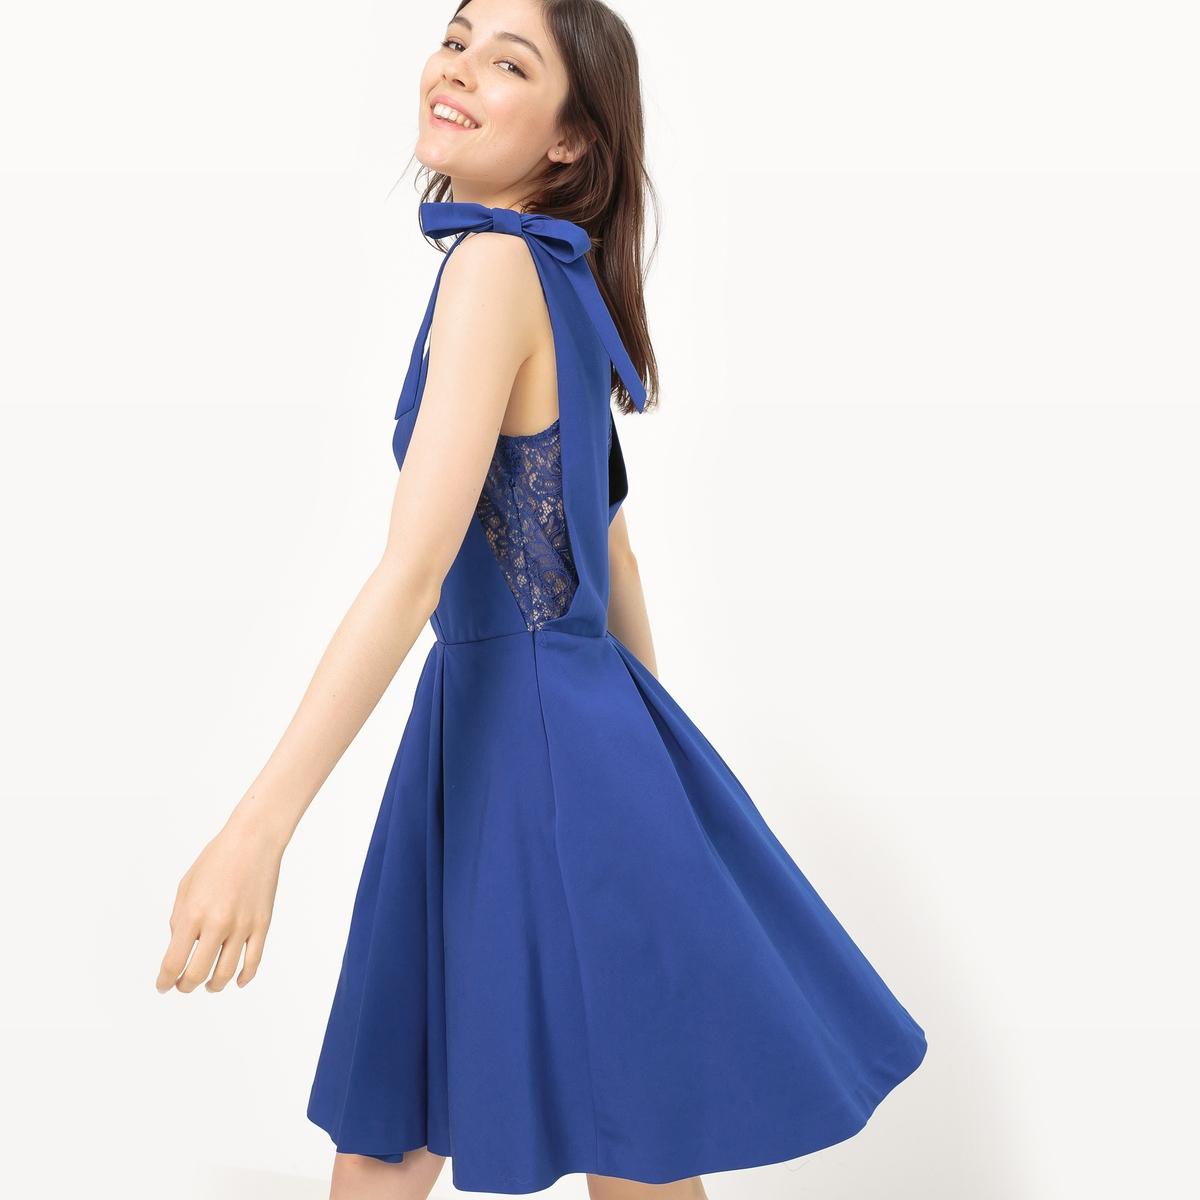 Платье короткое без рукавов платье без рукавов 85% хлопка